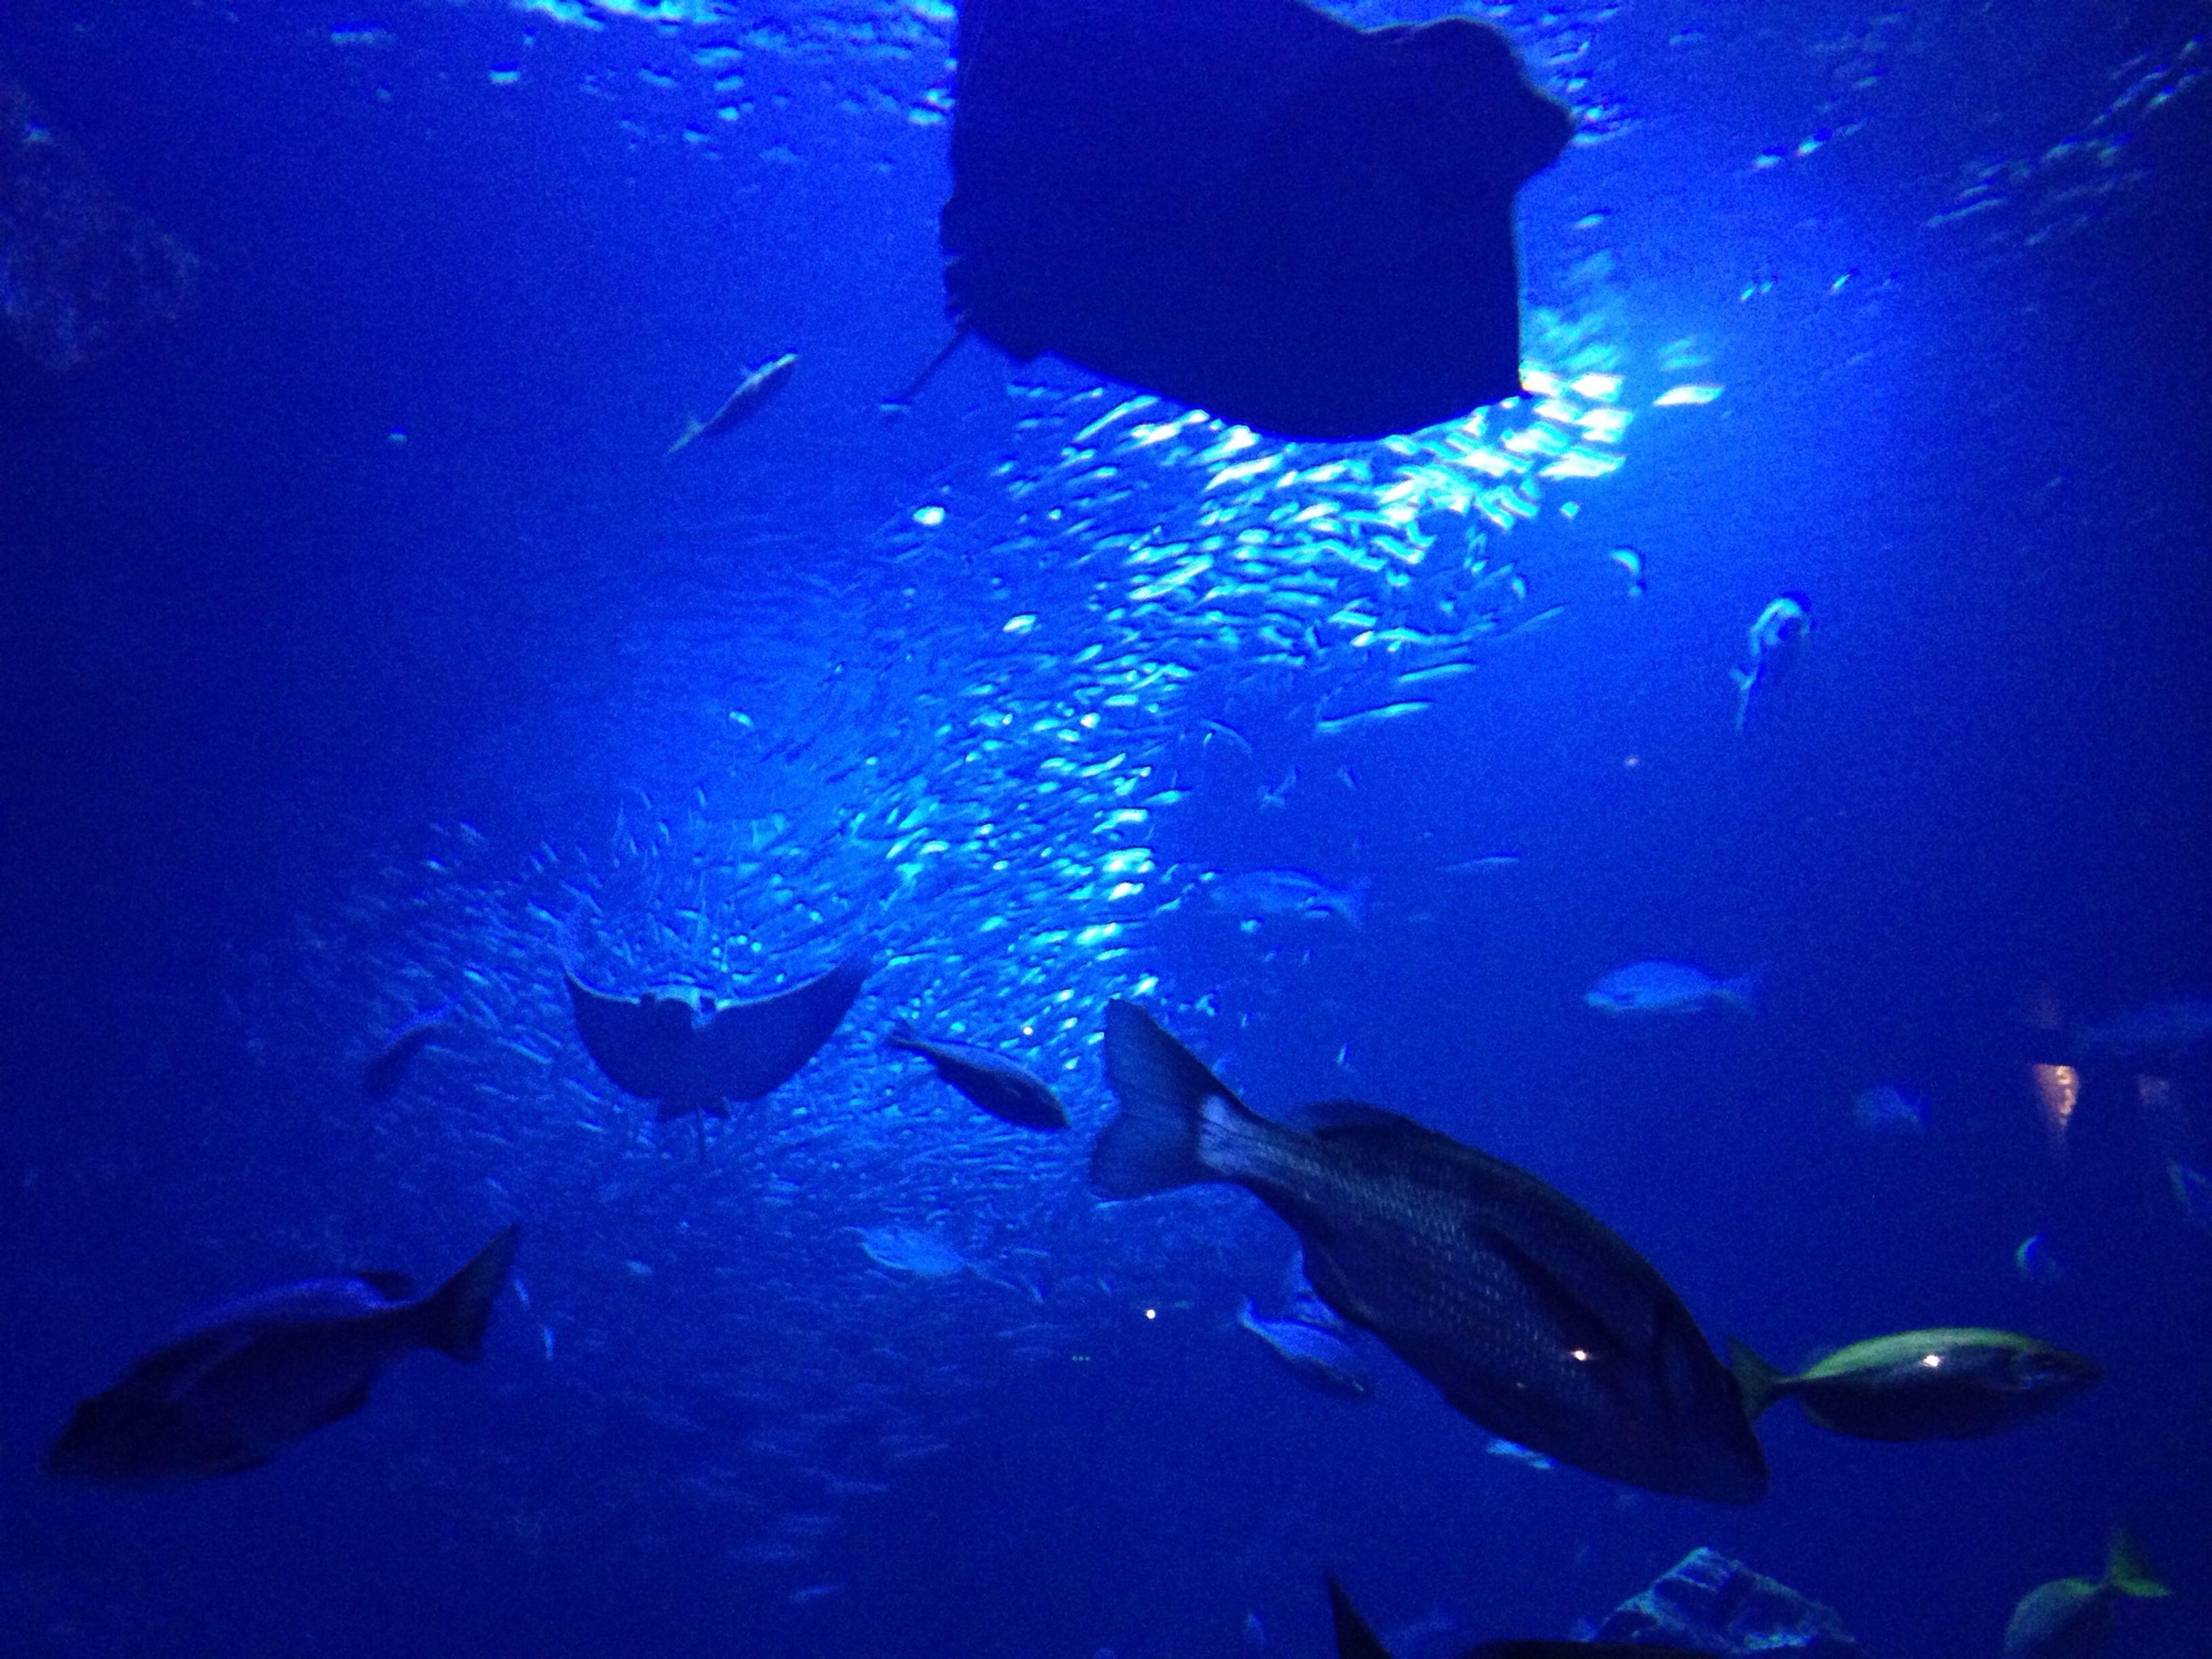 underwater, swimming, undersea, water, sea life, animal themes, blue, fish, sea, animals in the wild, wildlife, aquarium, school of fish, transparent, nature, indoors, animals in captivity, beauty in nature, one animal